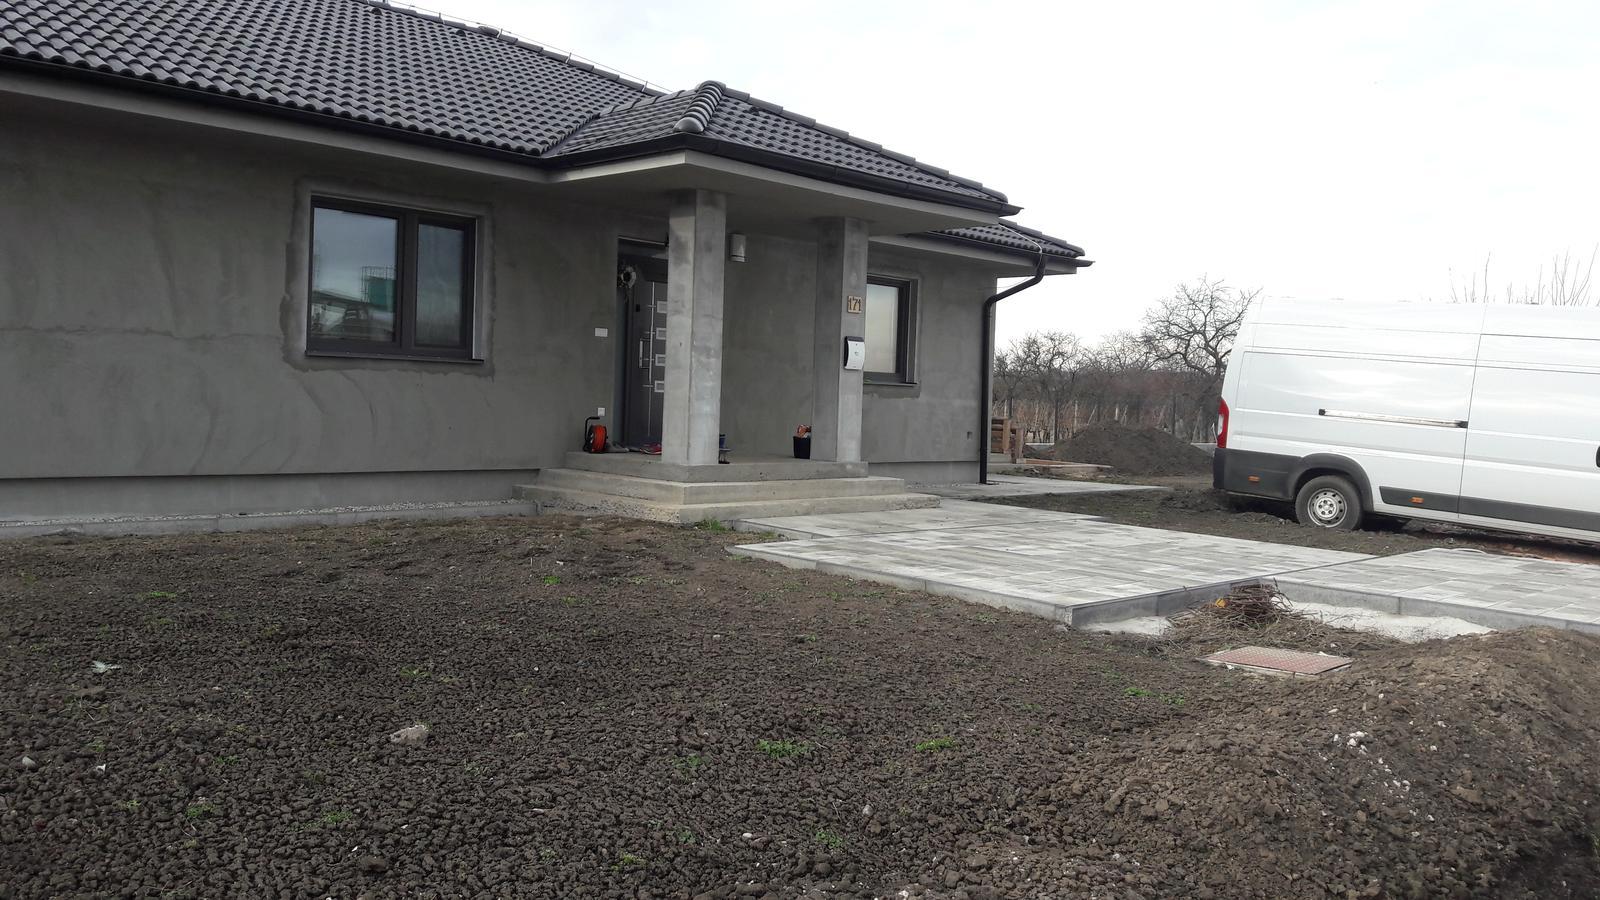 Okolie domu - Obrázok č. 47